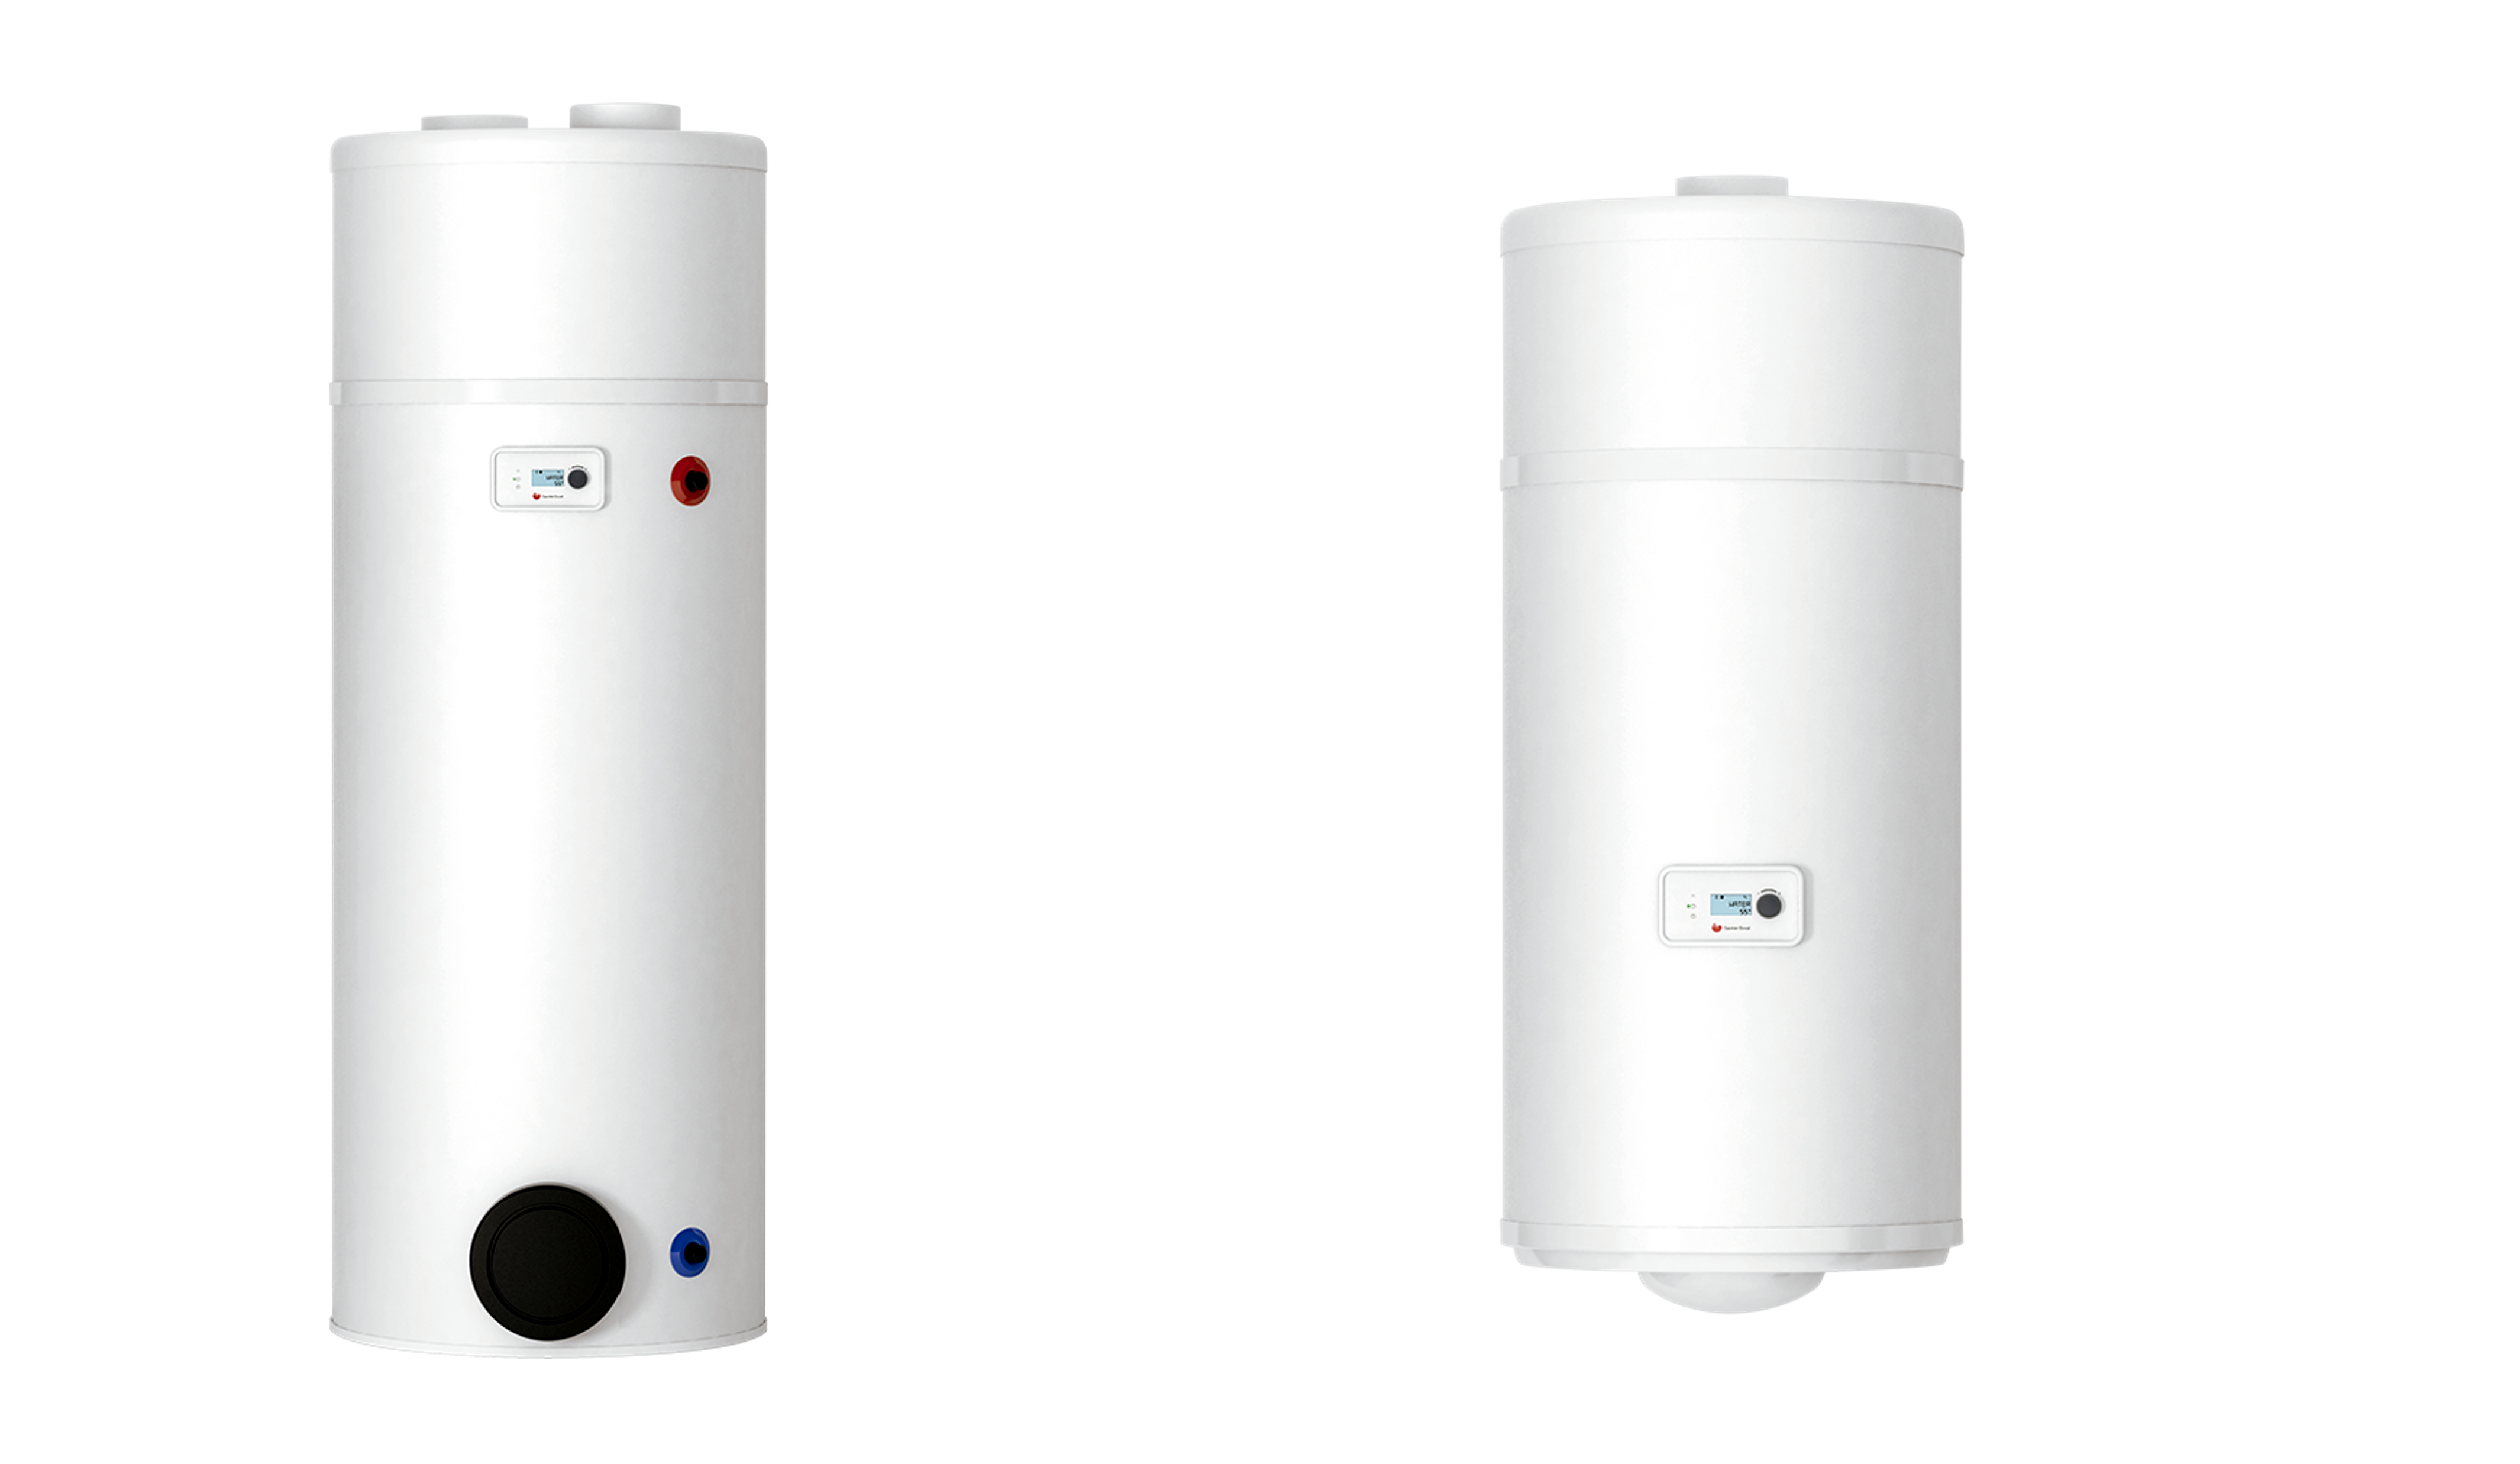 Bomba de calor ACS eficiente y ecológica